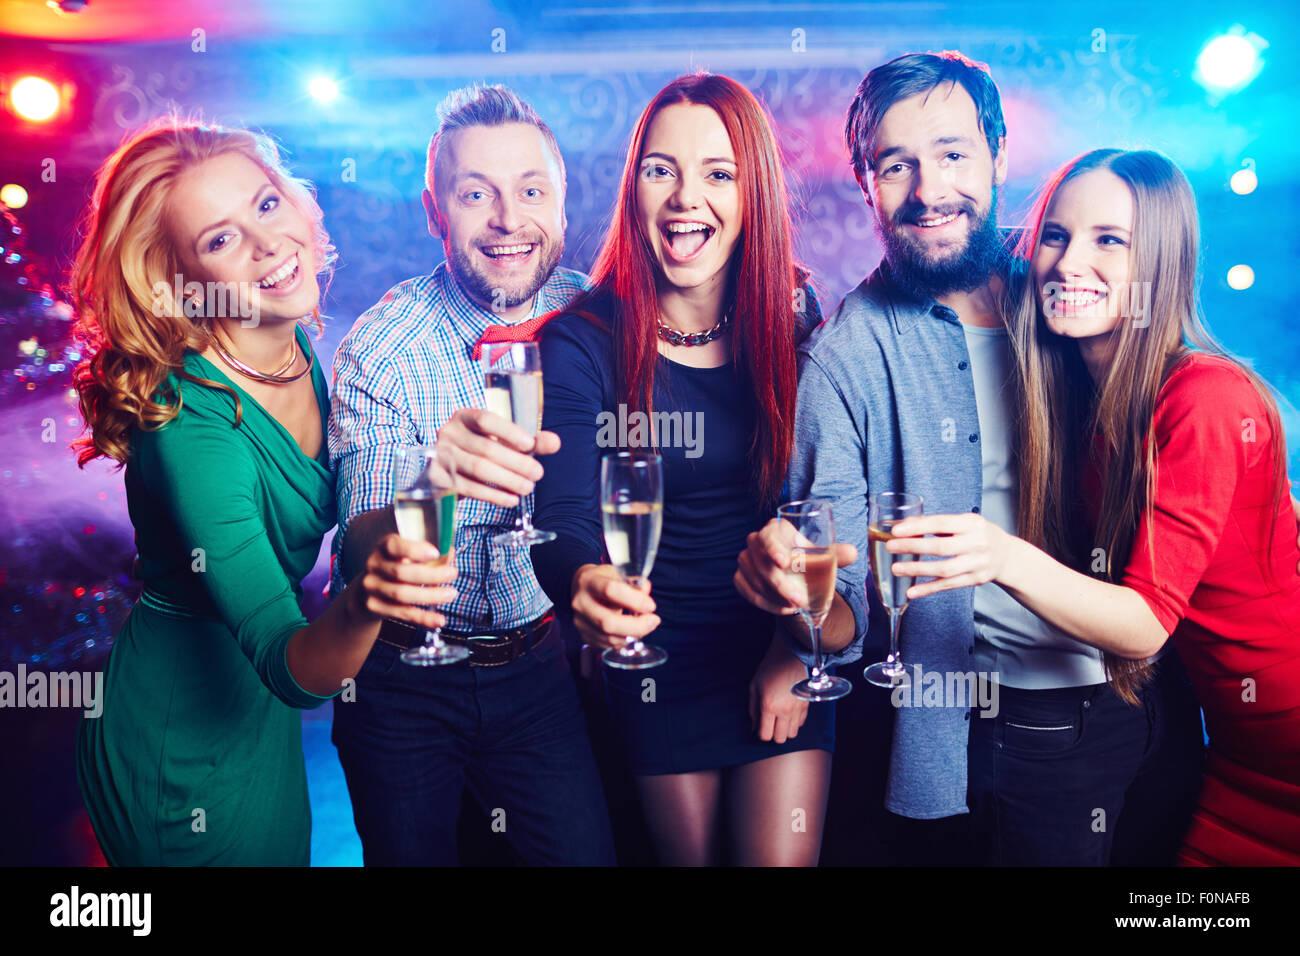 Joyful friends drinking wine at nightclub Stock Photo